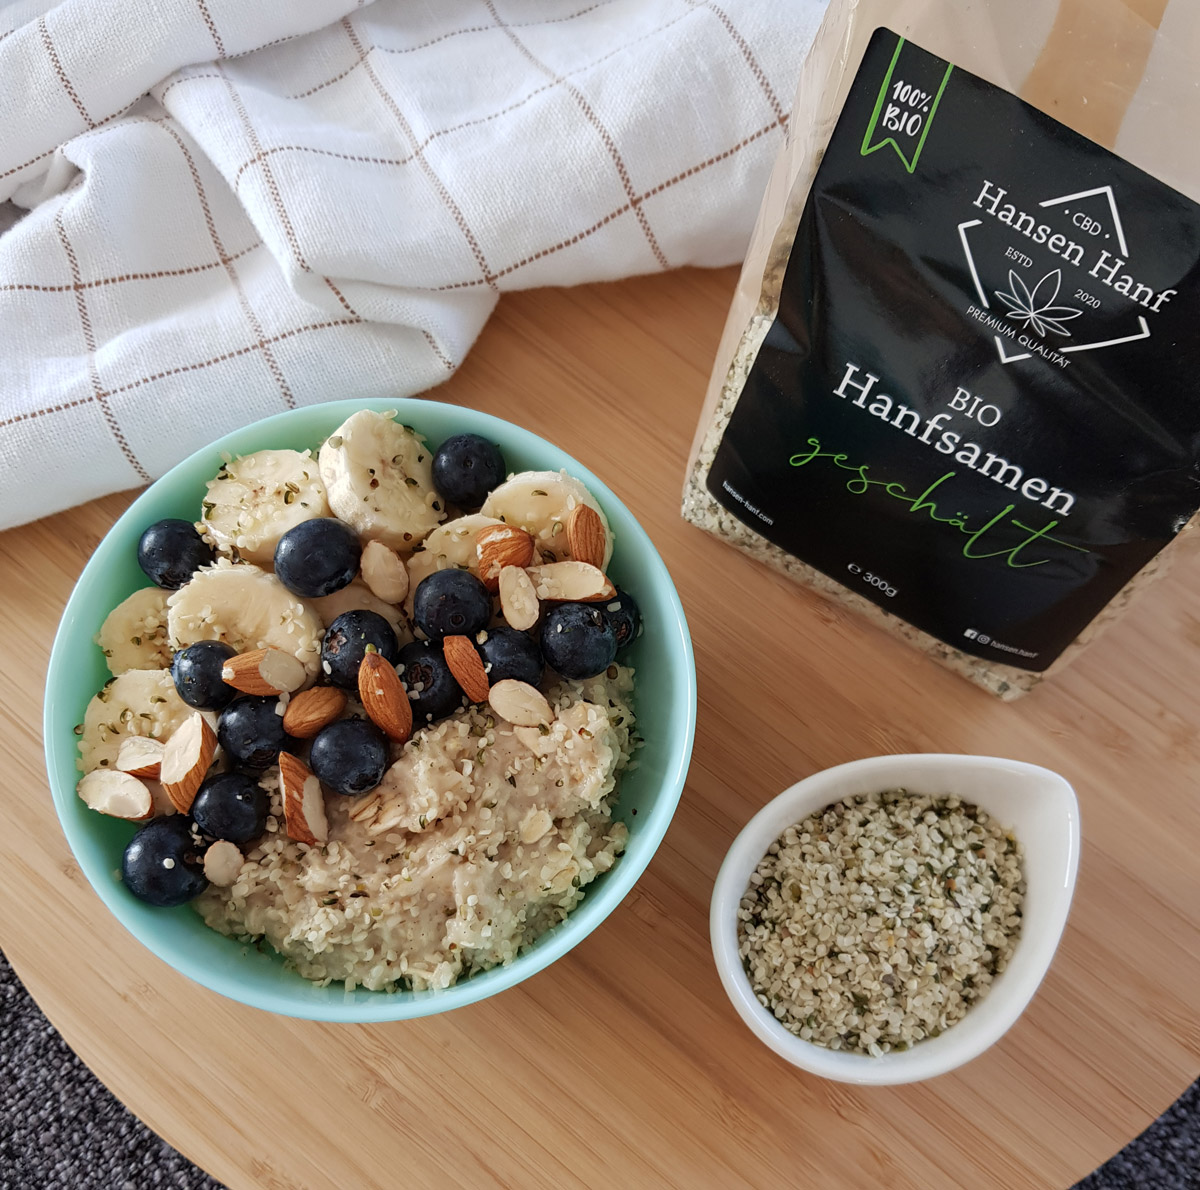 HansenHanf-Porridge